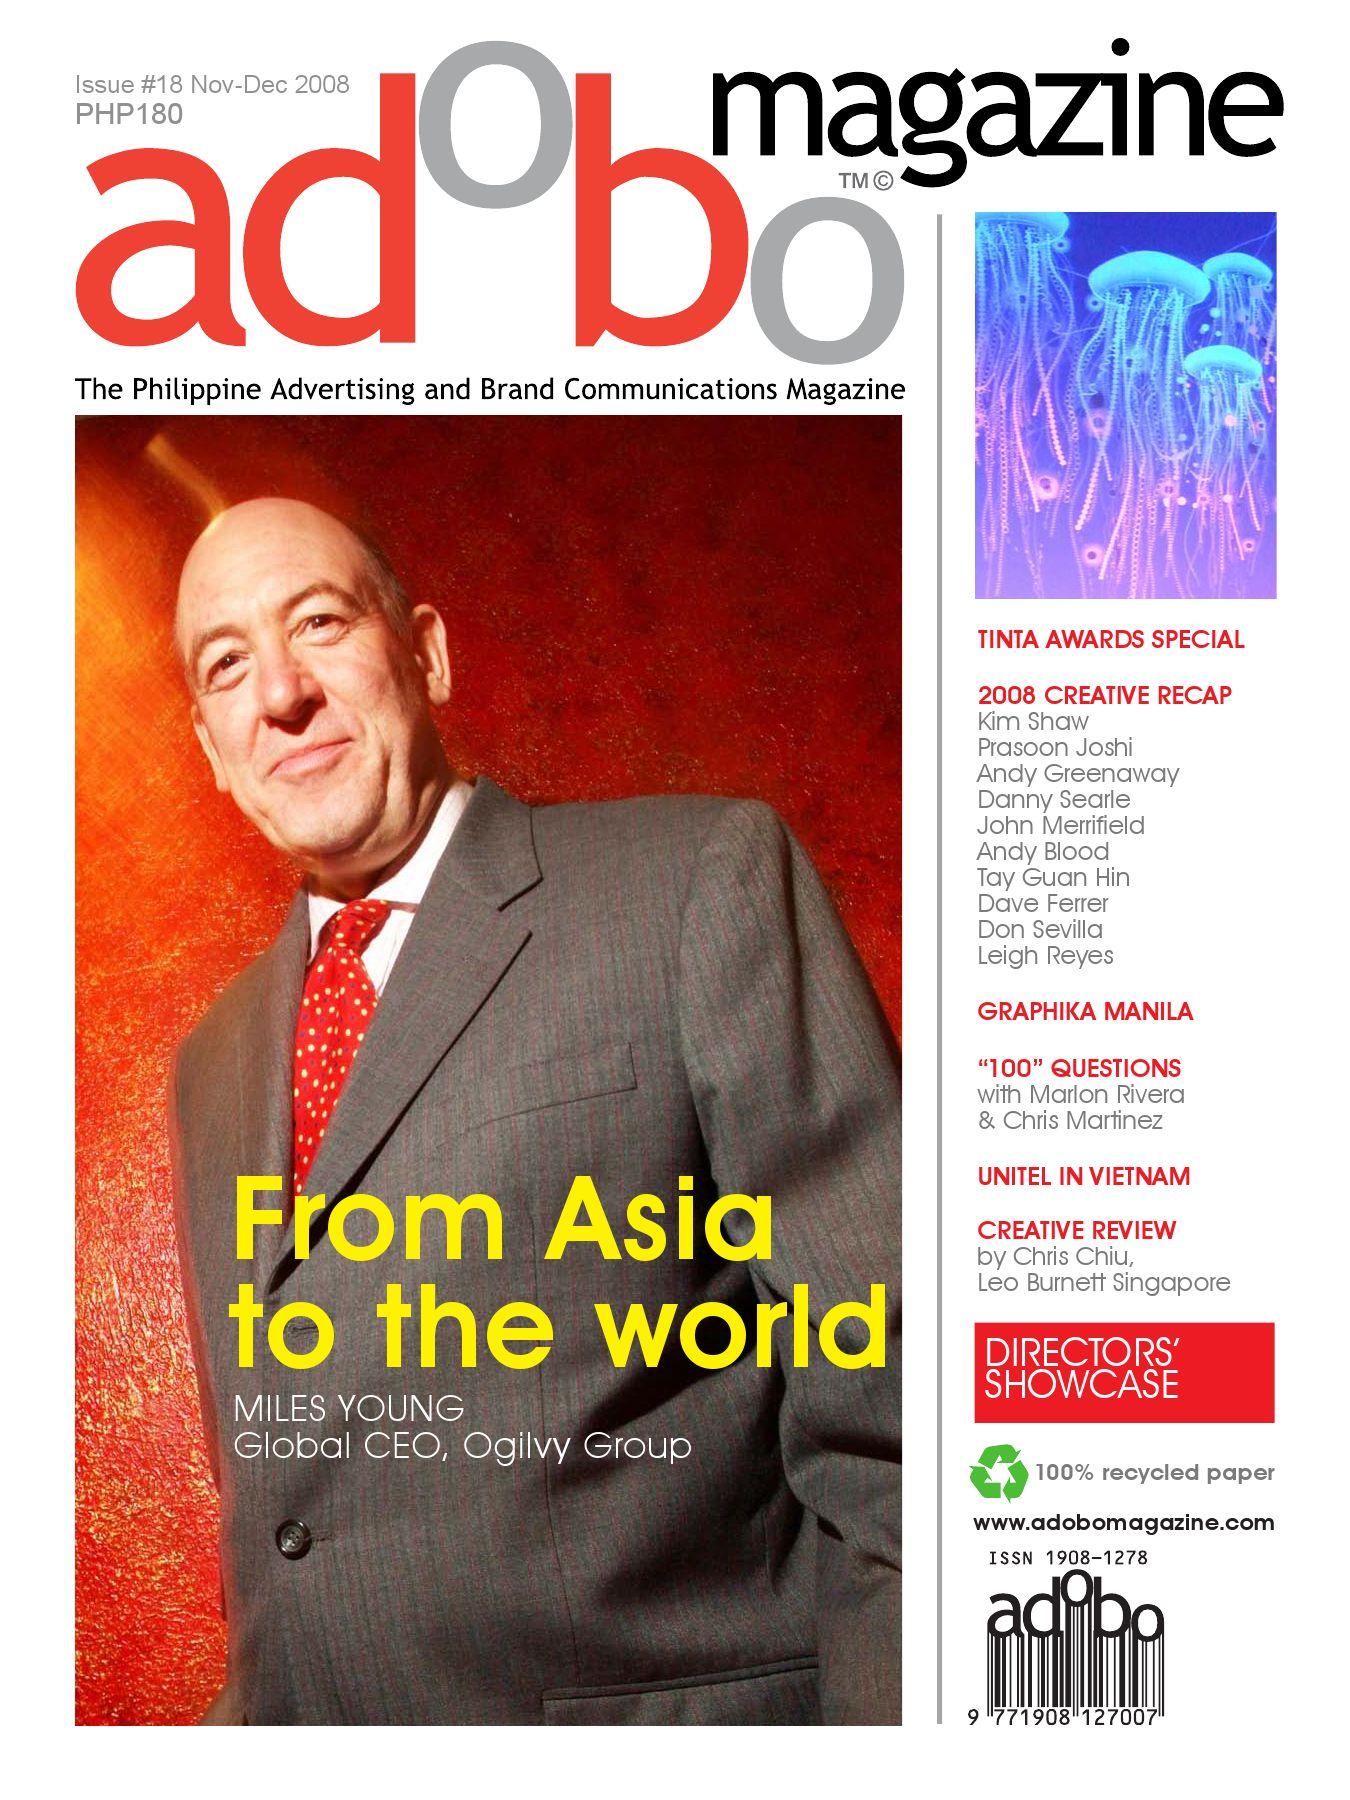 c1c481a350f6 adobo magazine | November - December 2008 by Sanserif, Inc. - issuu